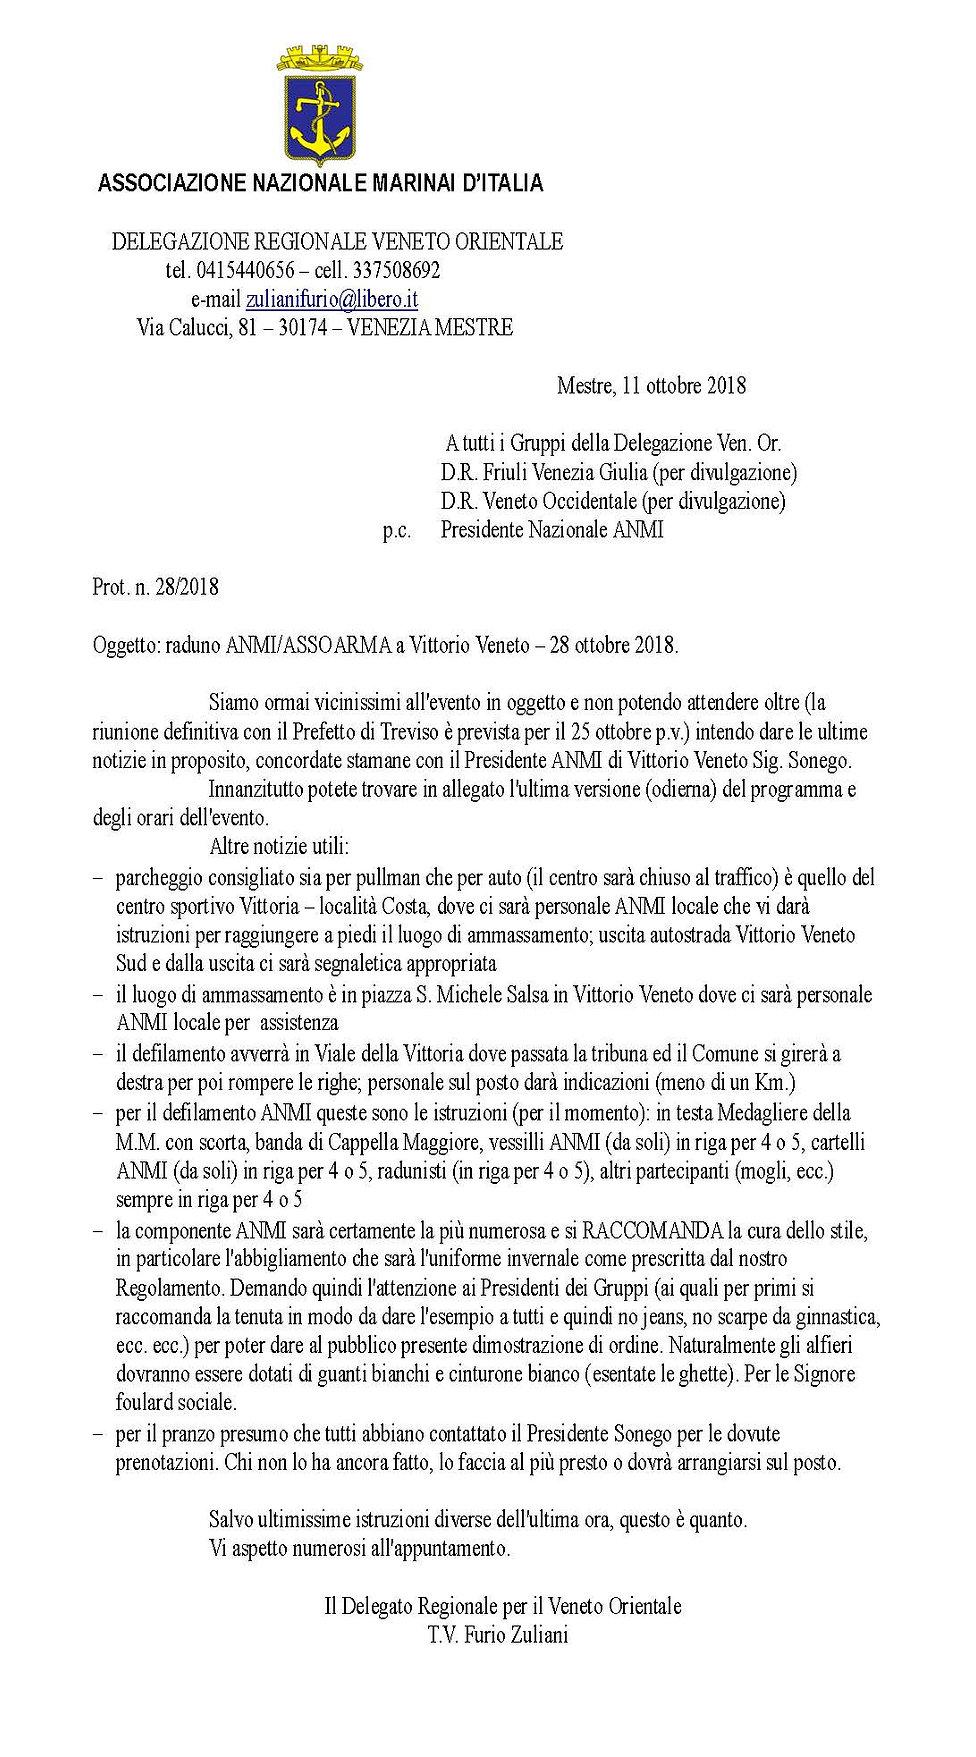 carta int DR.jpg